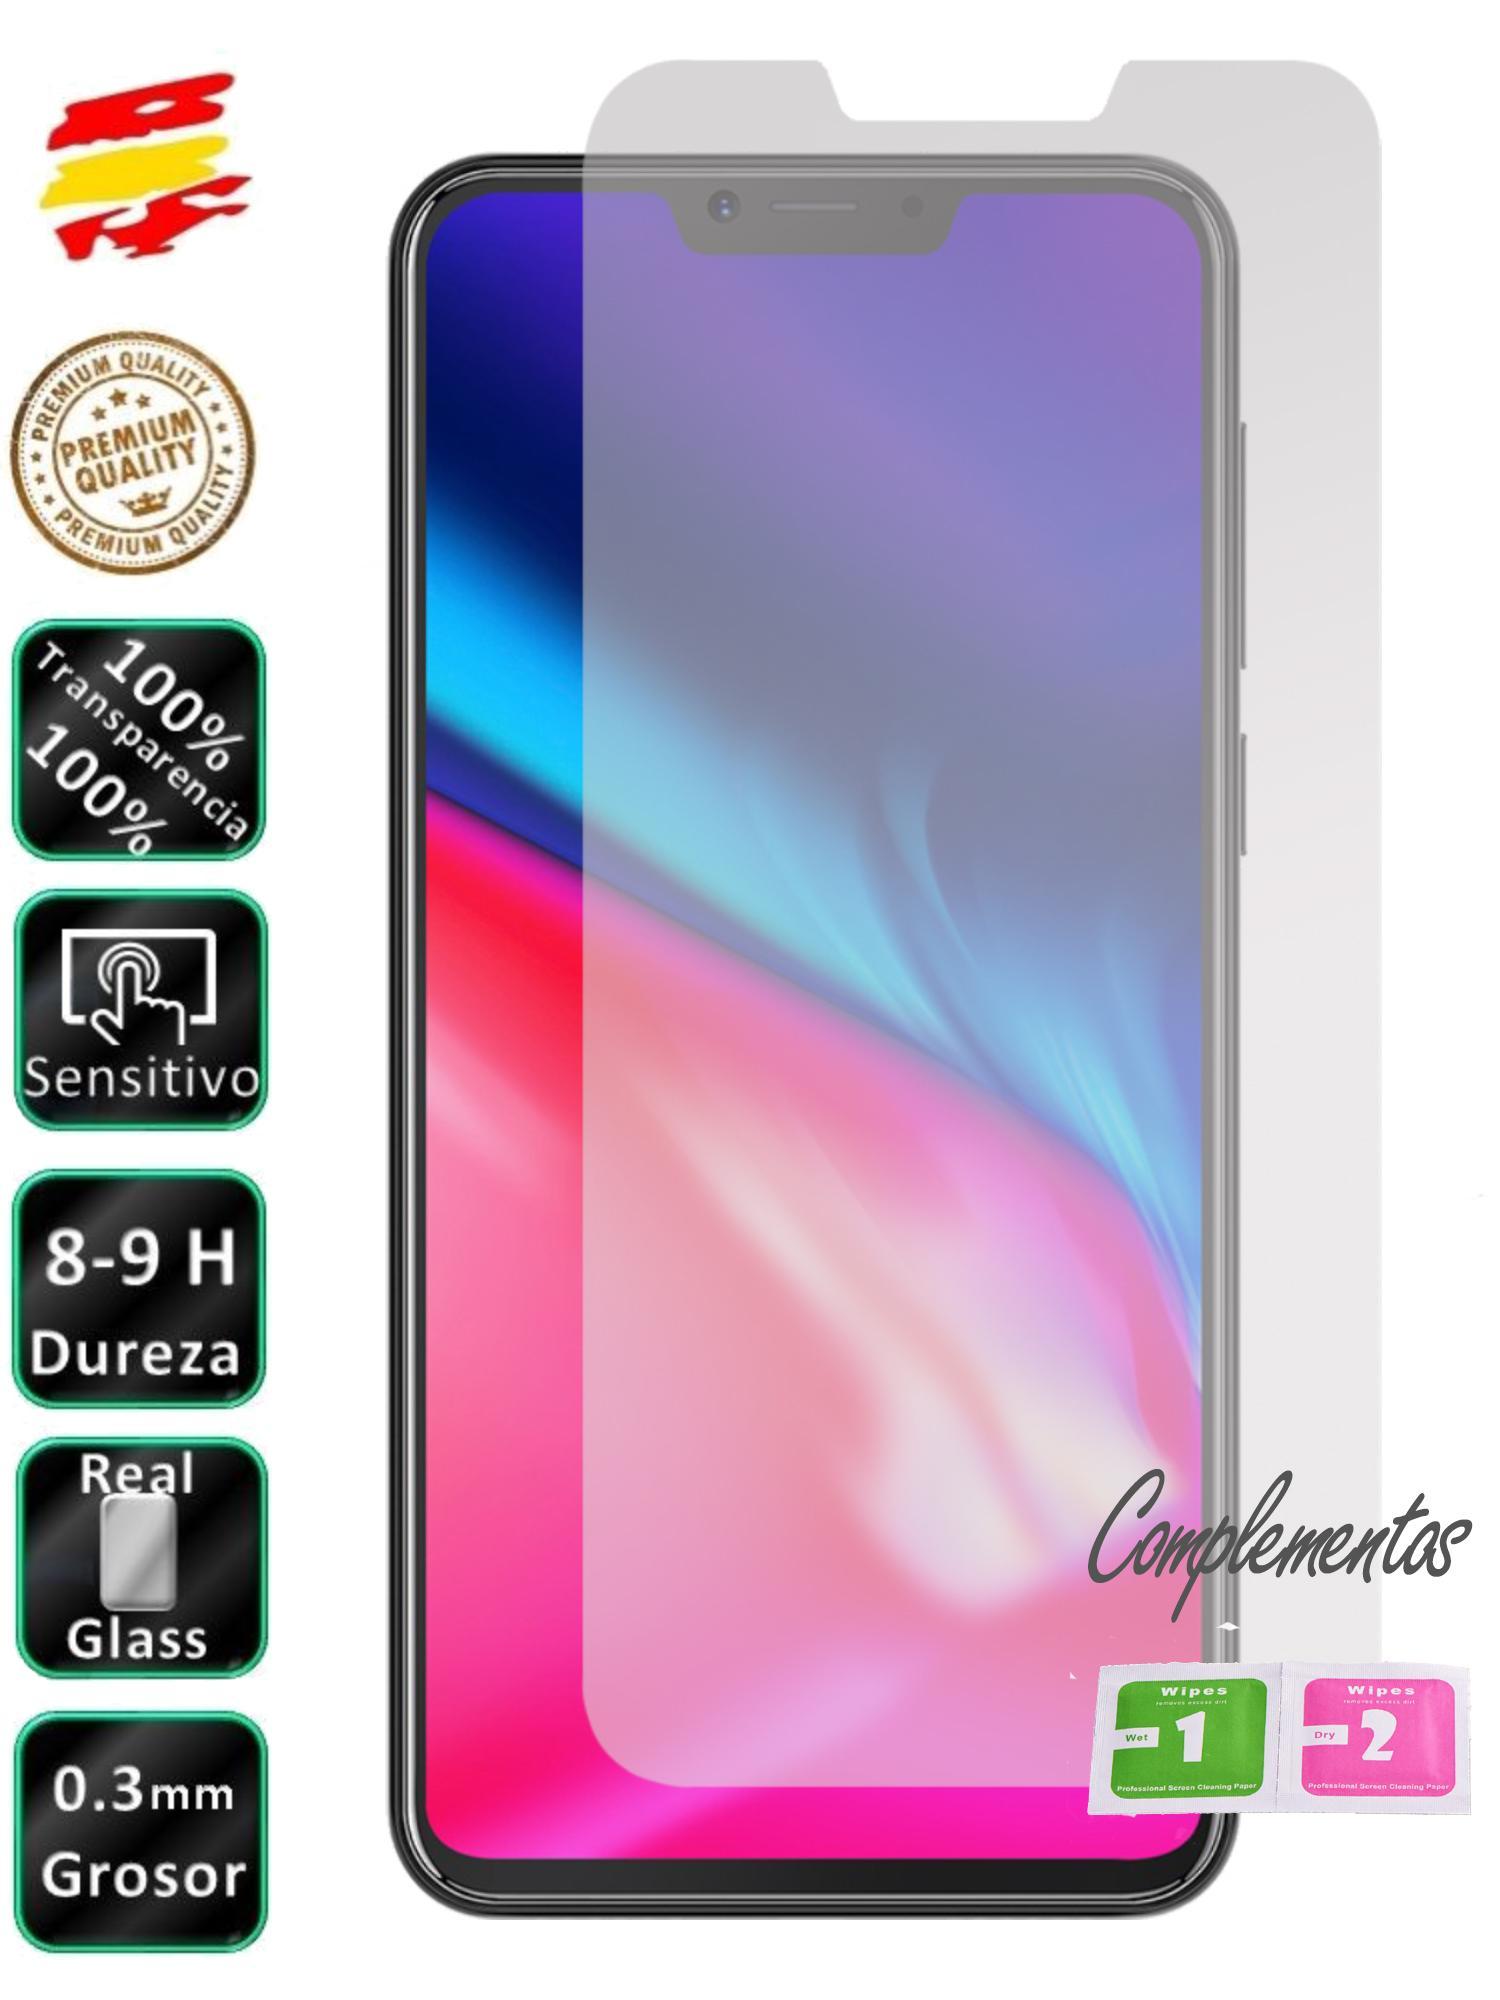 Protector For Huawei P8/P9/P10/P20/P30/LITE/PRO/SMART Tempered Glass De Vidrio Screen 9H Java